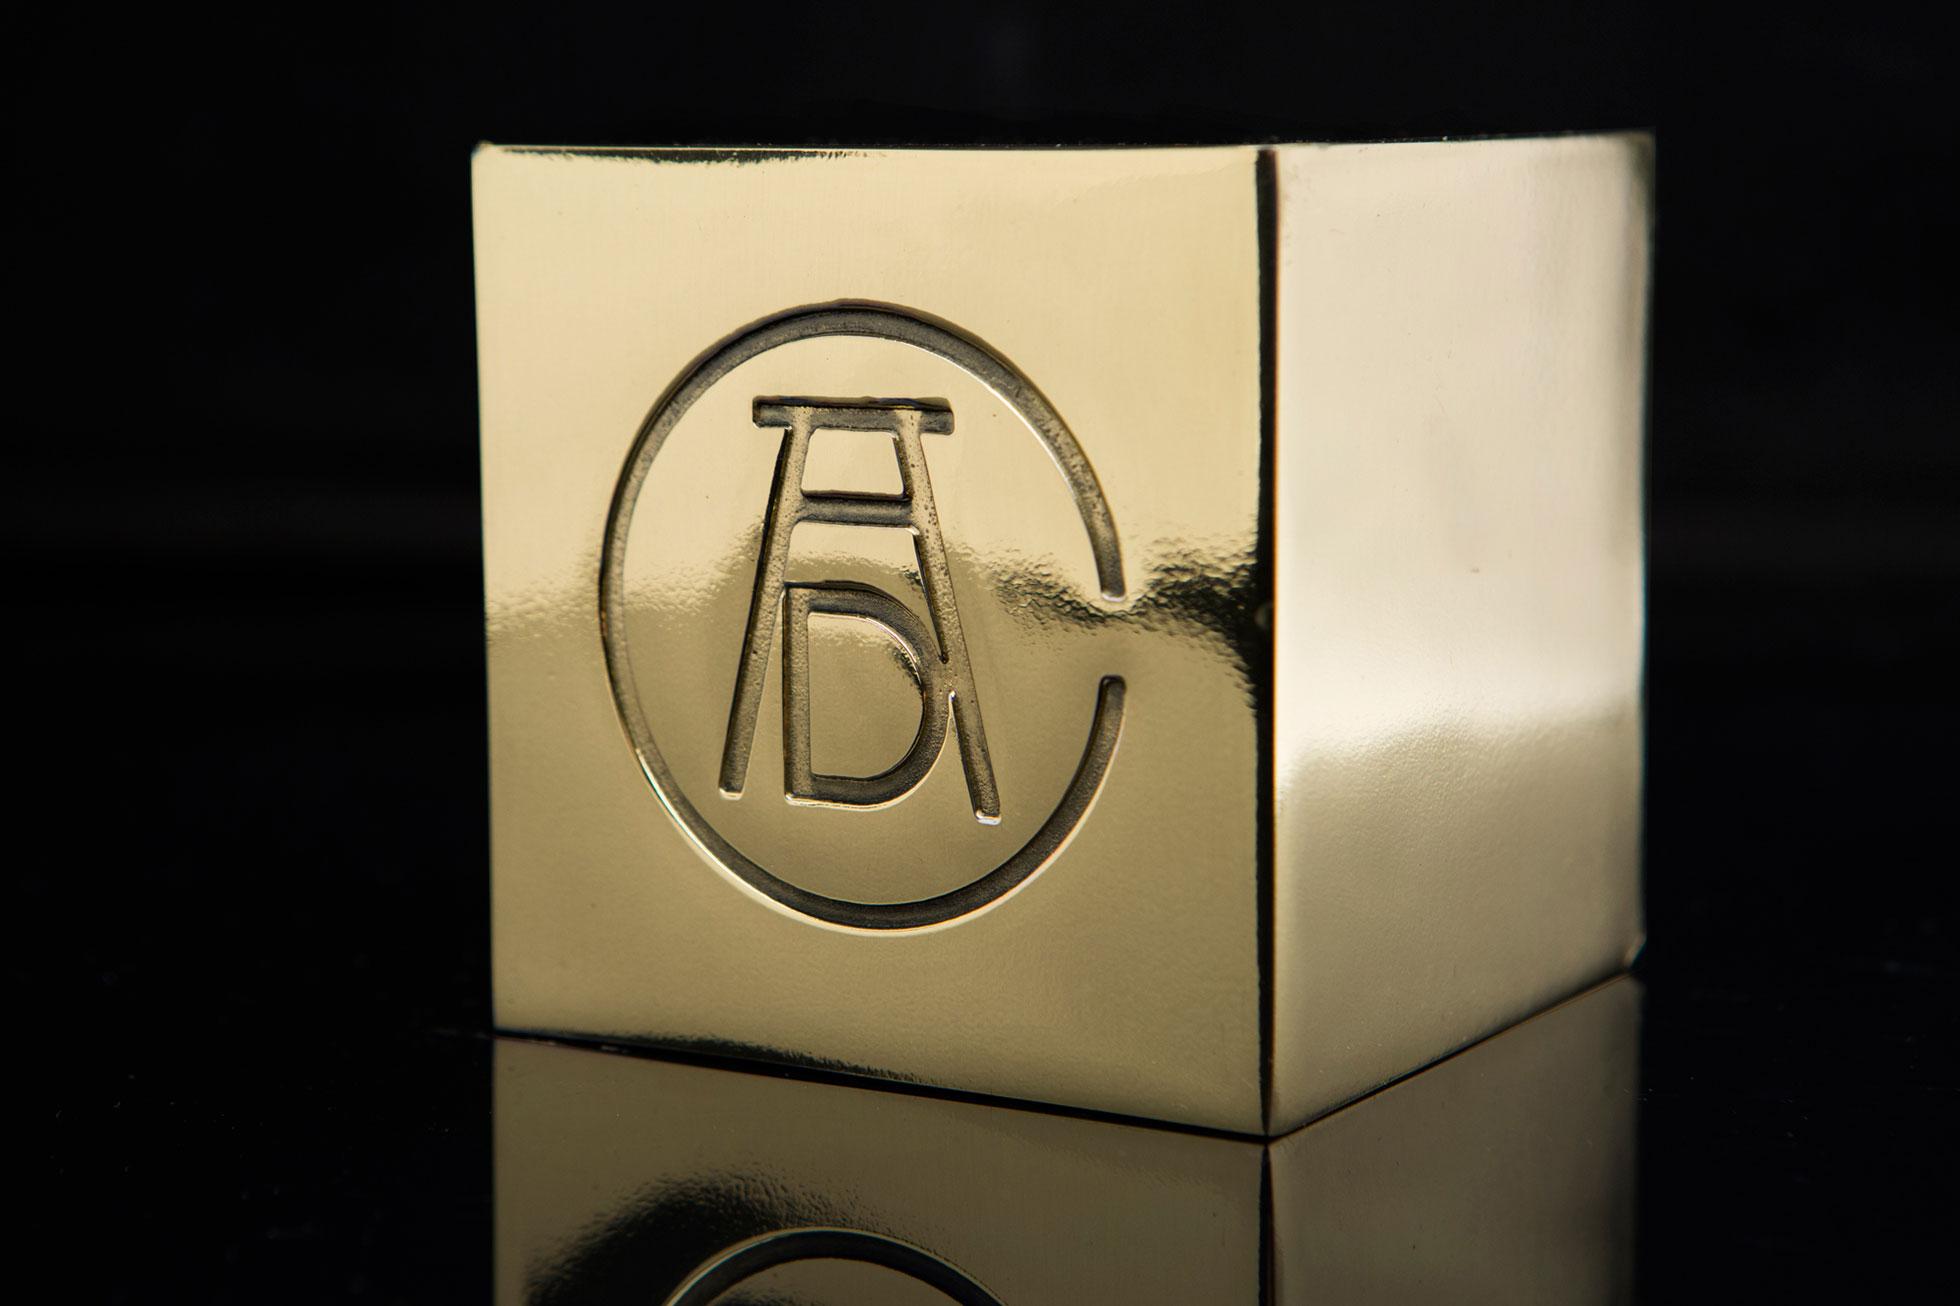 Ancient metallic cube